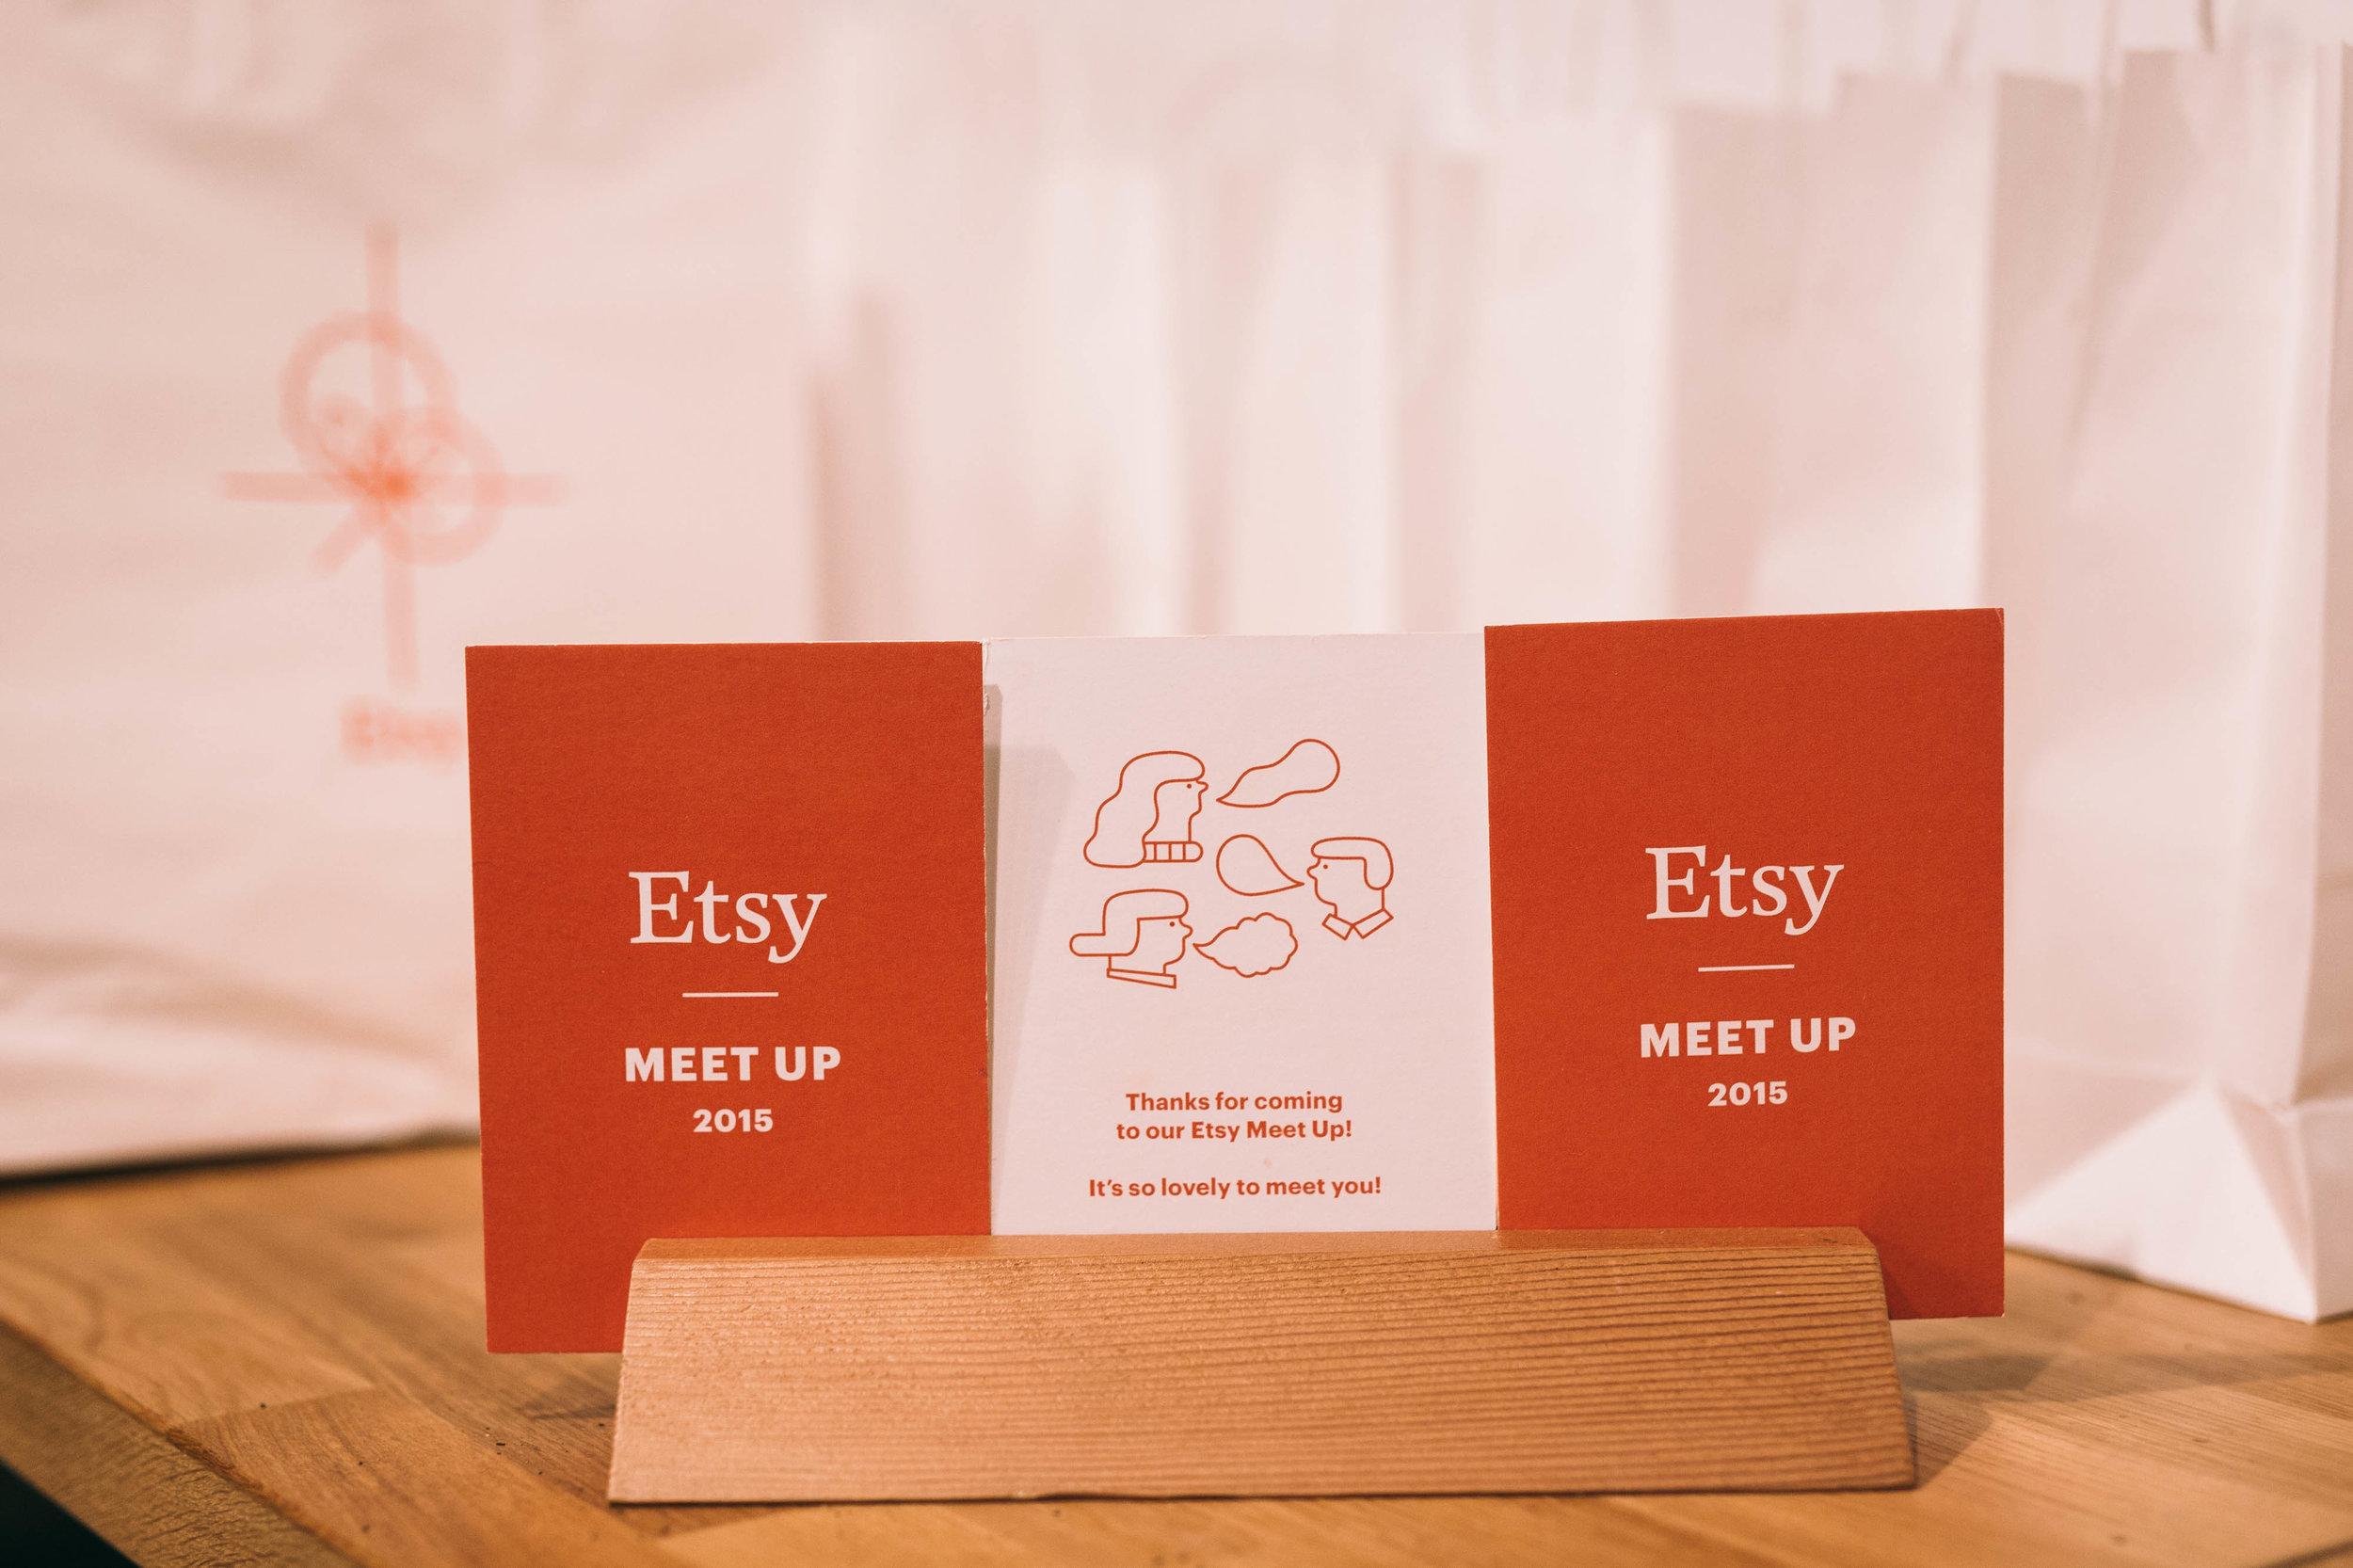 ETSY - MEET UP